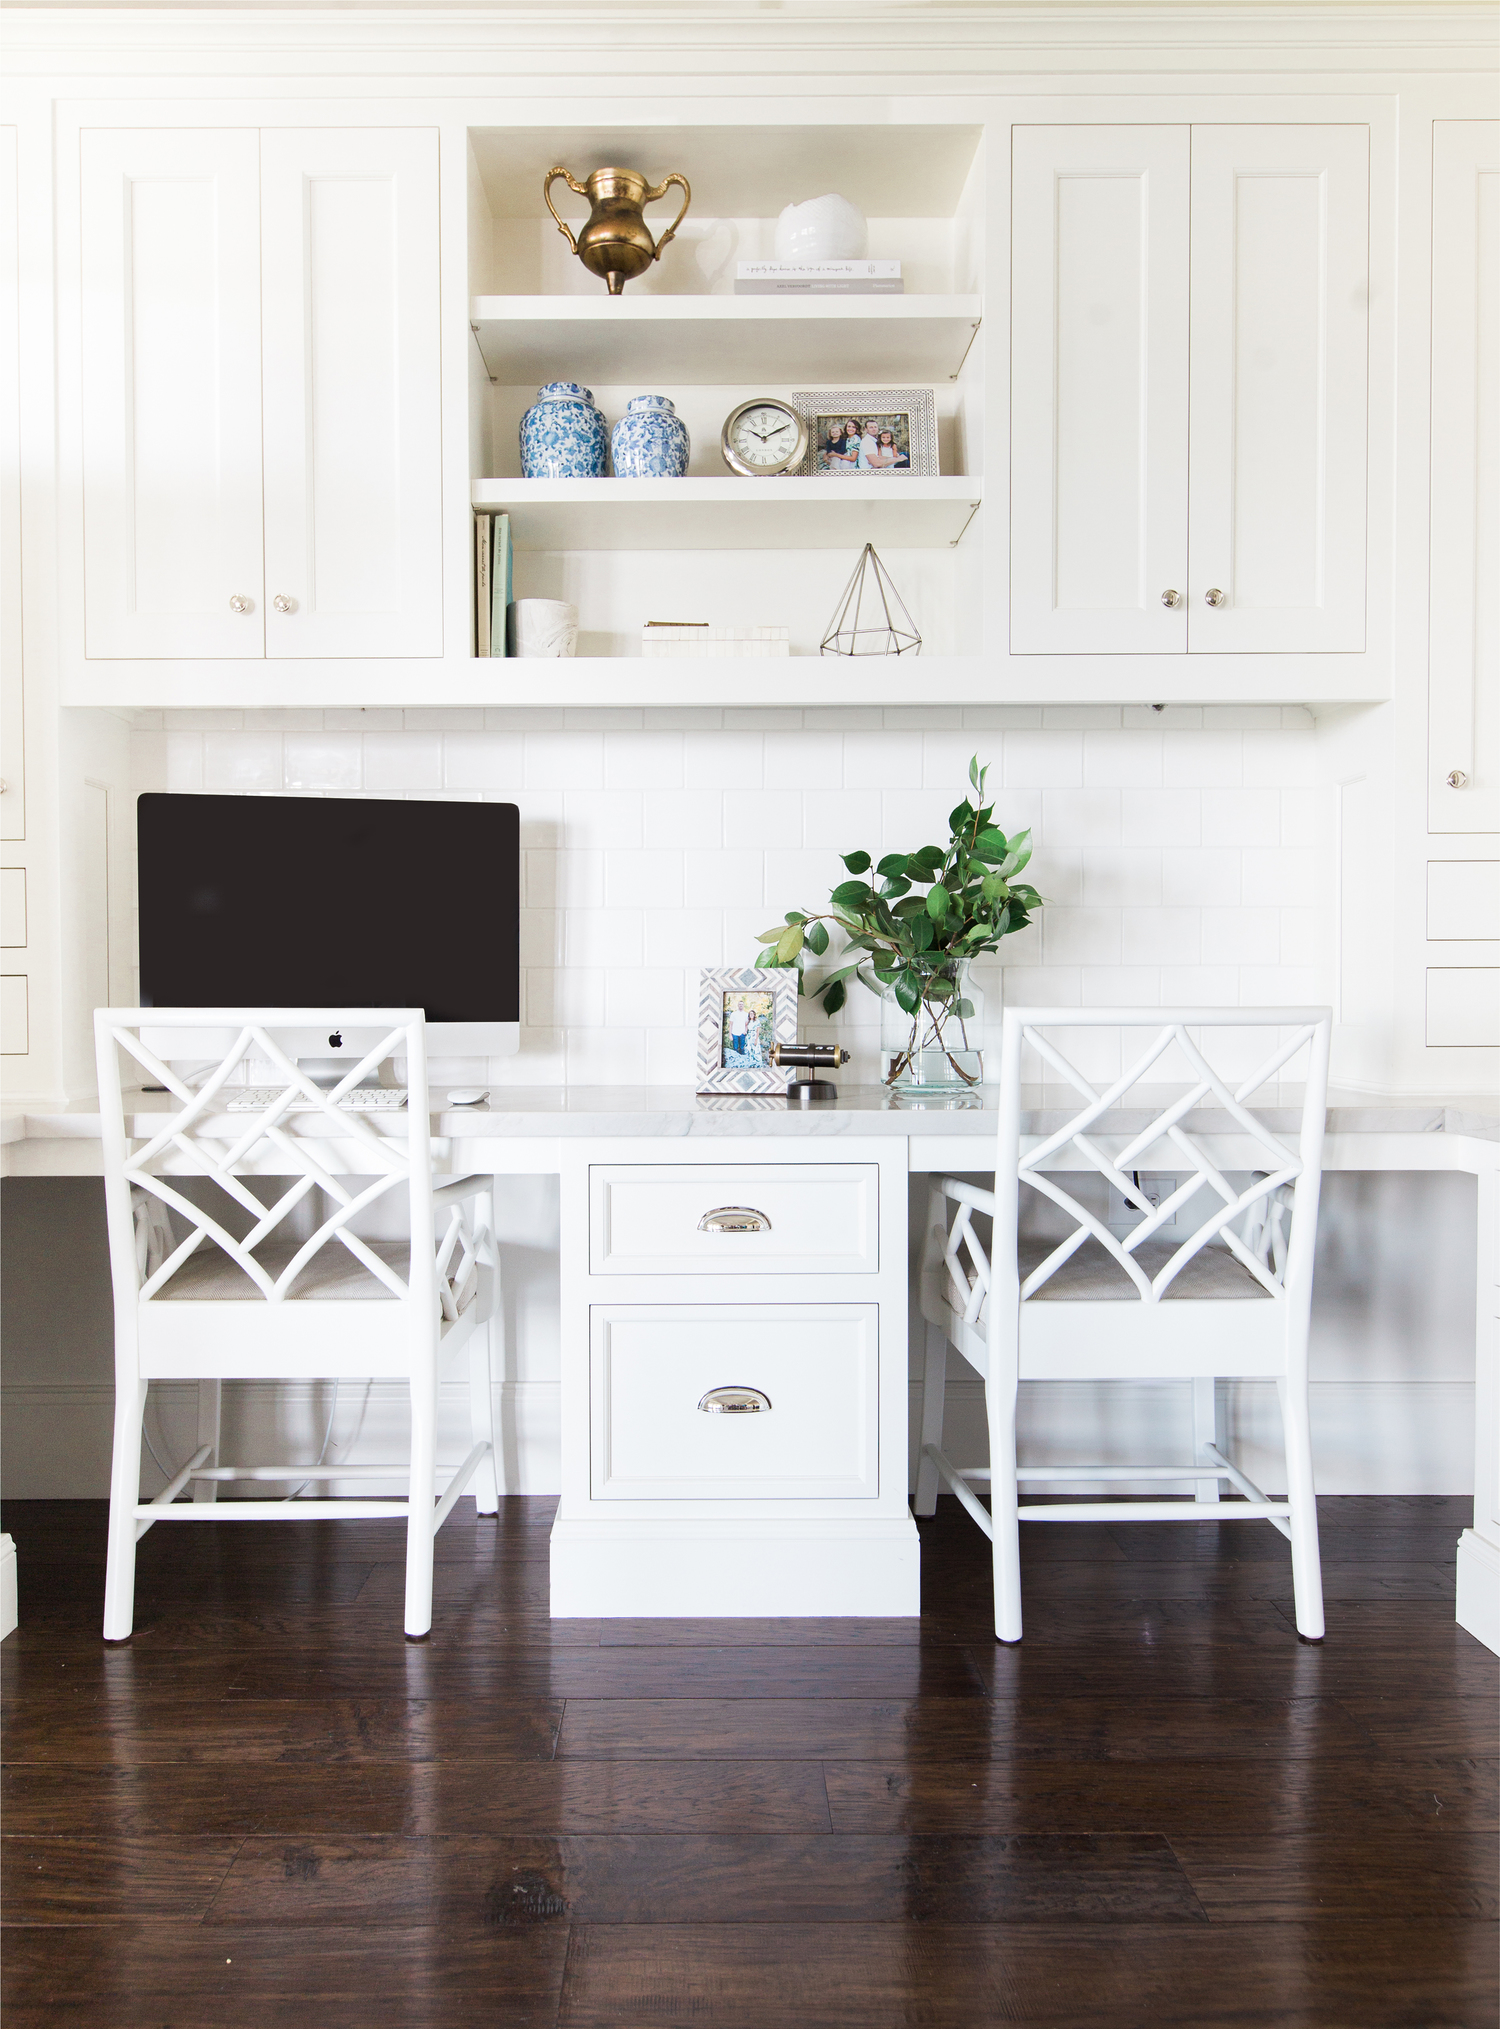 Built-in+Desk+in+Kitchen+||+Studio+McGee.jpg